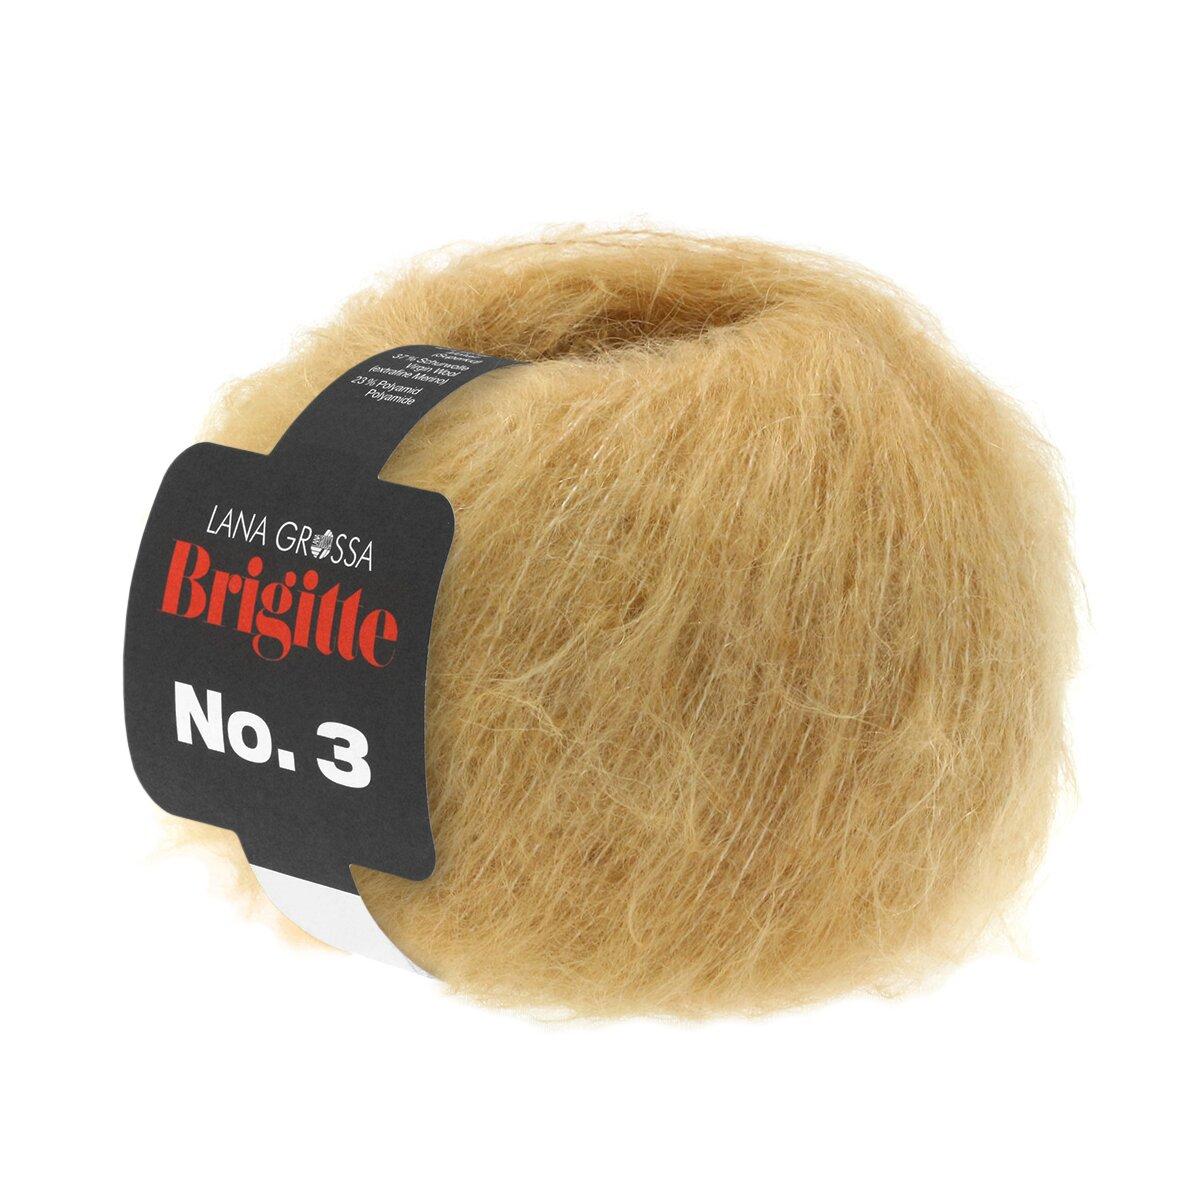 Wolle Kreativ 3 Fb 19 camel 25 g Lana Grossa Brigitte No